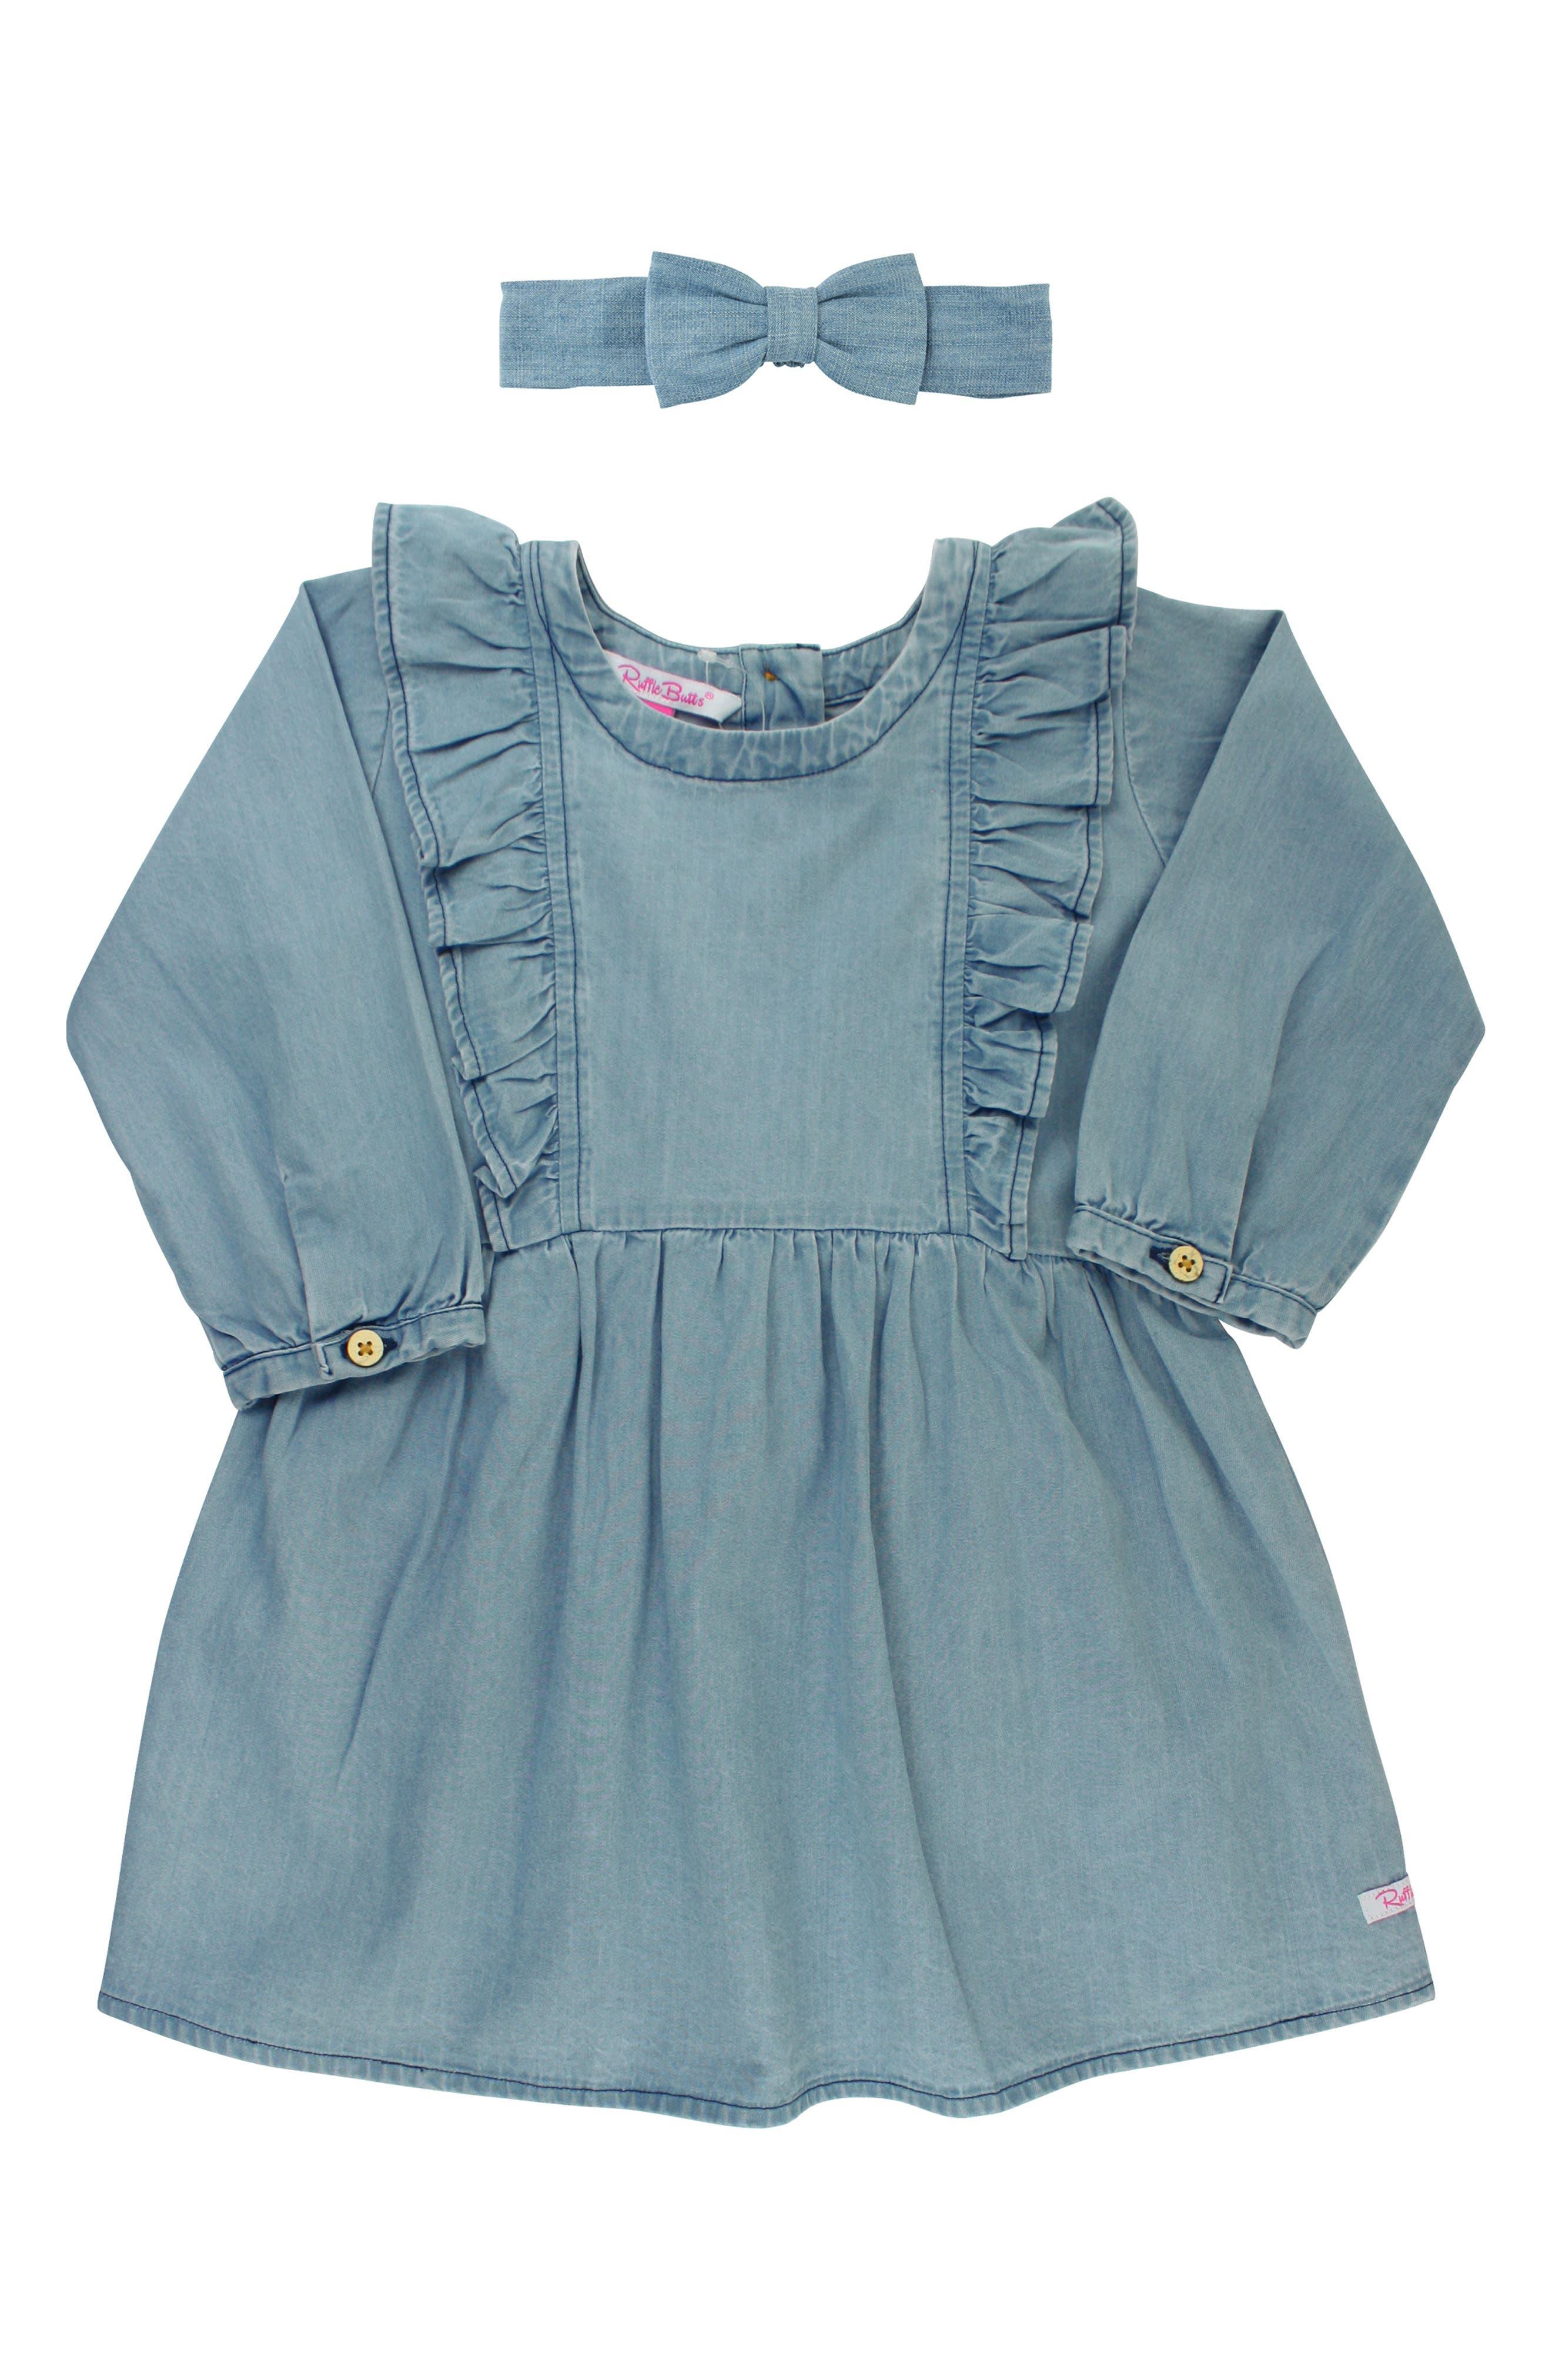 RUFFLEBUTTS Cotton Chambray Dress & Headband Set, Main, color, BLUE